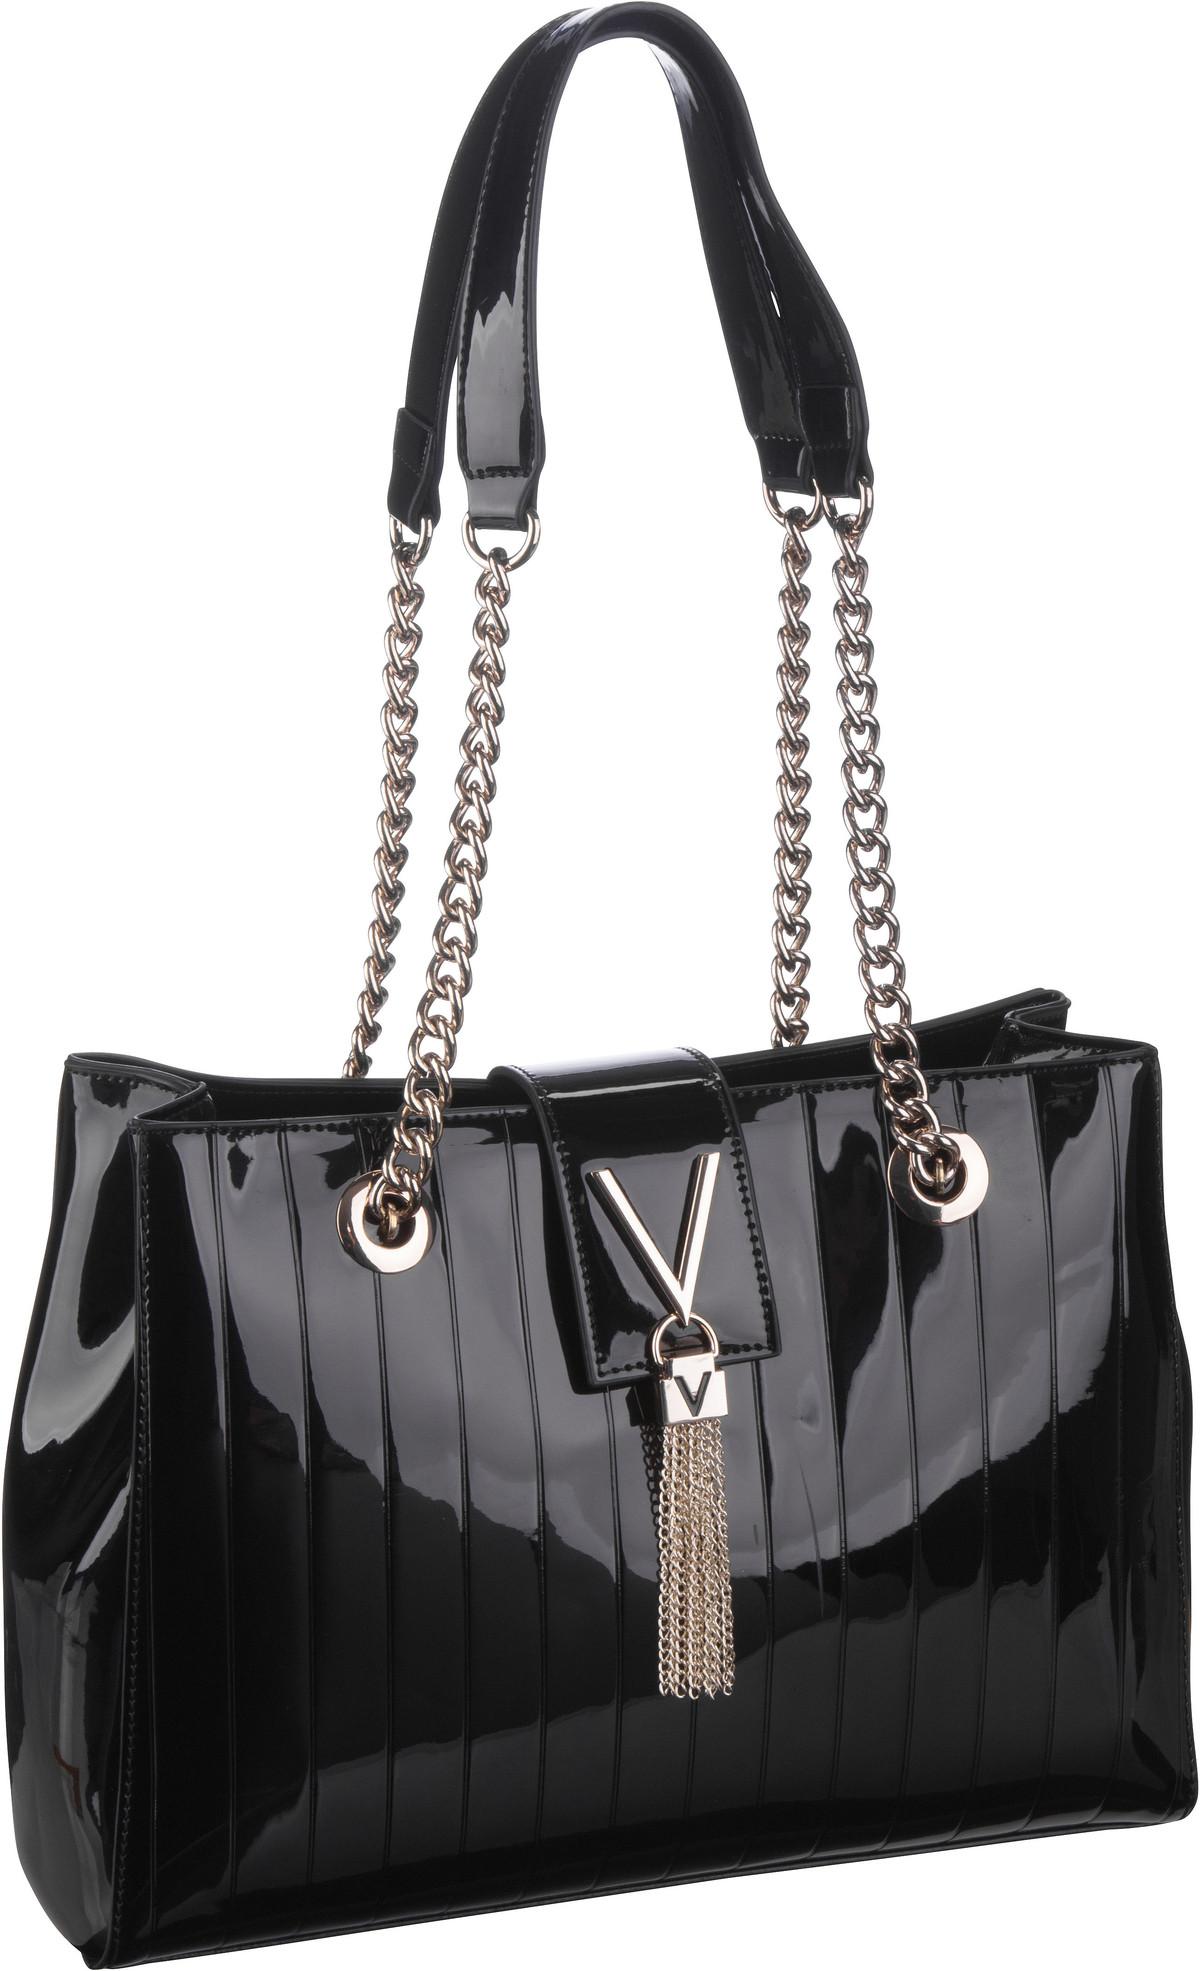 Bags Handtasche Bongo Shopping K06 Nero